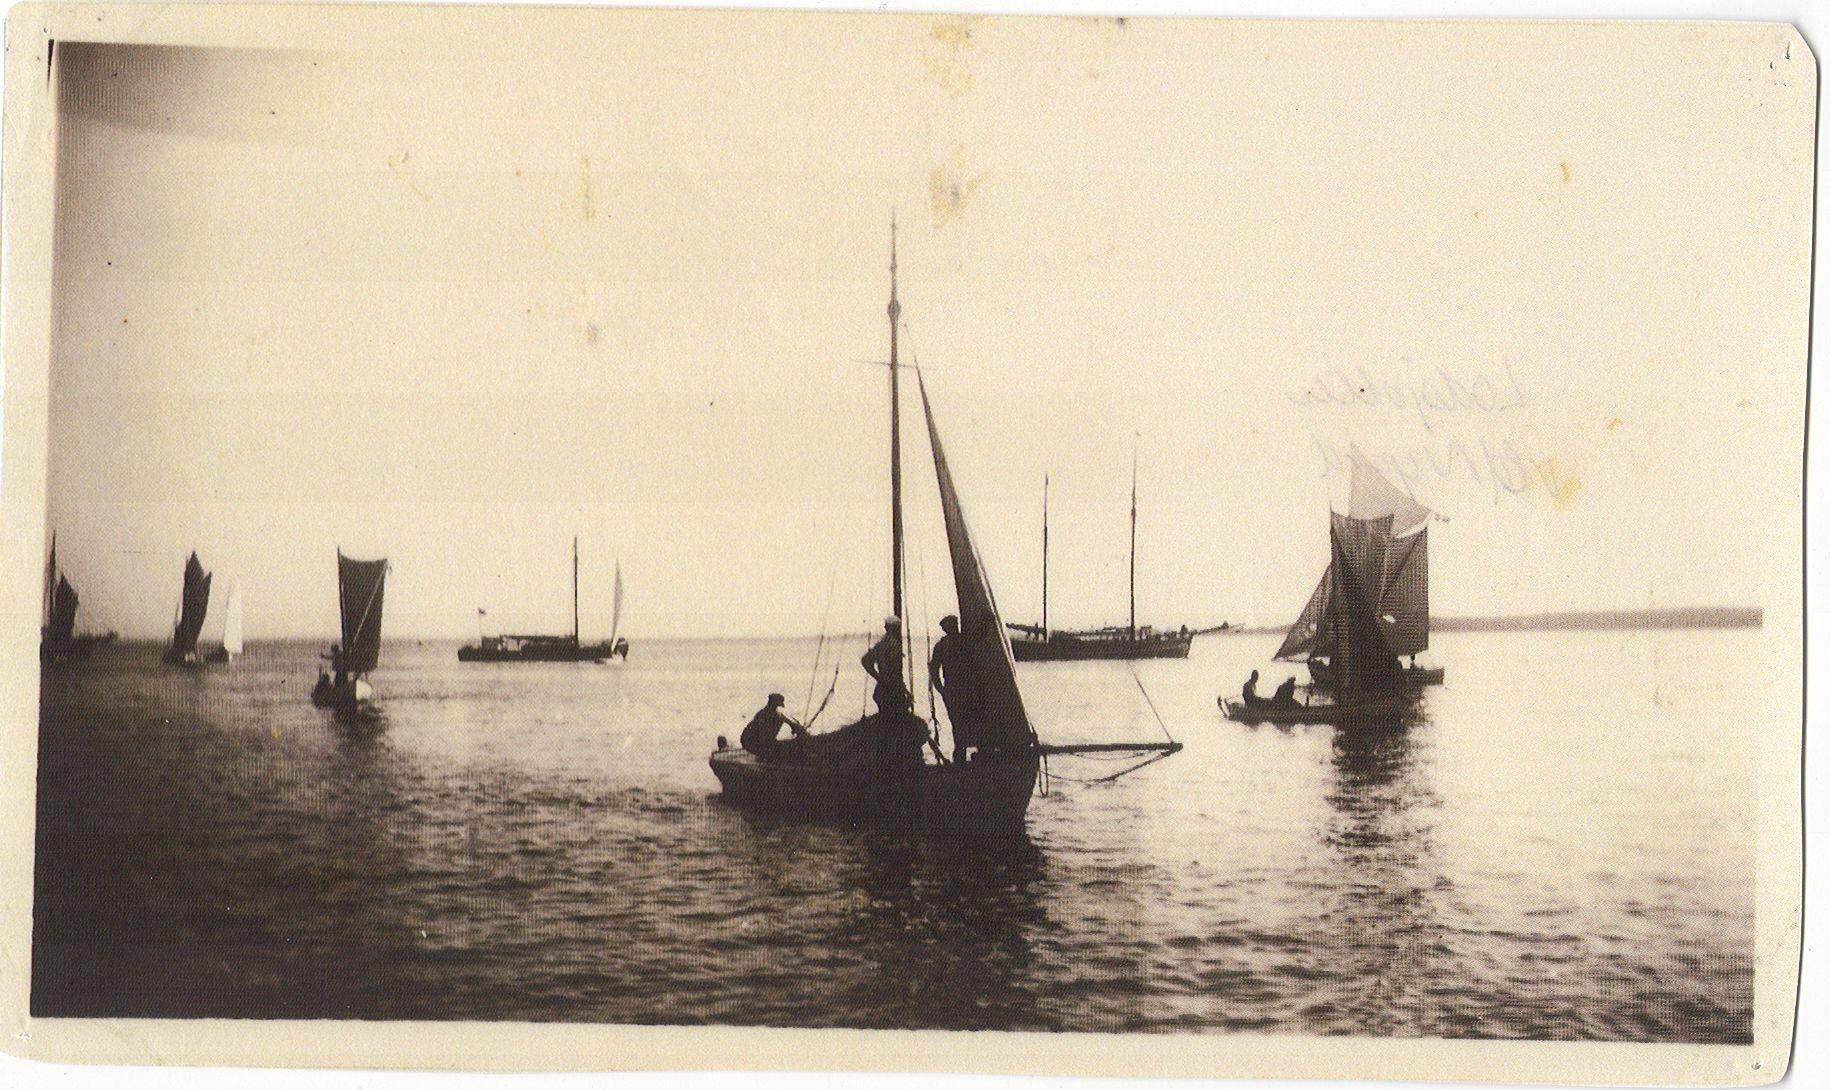 #Nyord #Lodsjollerne #historie #lodsøen